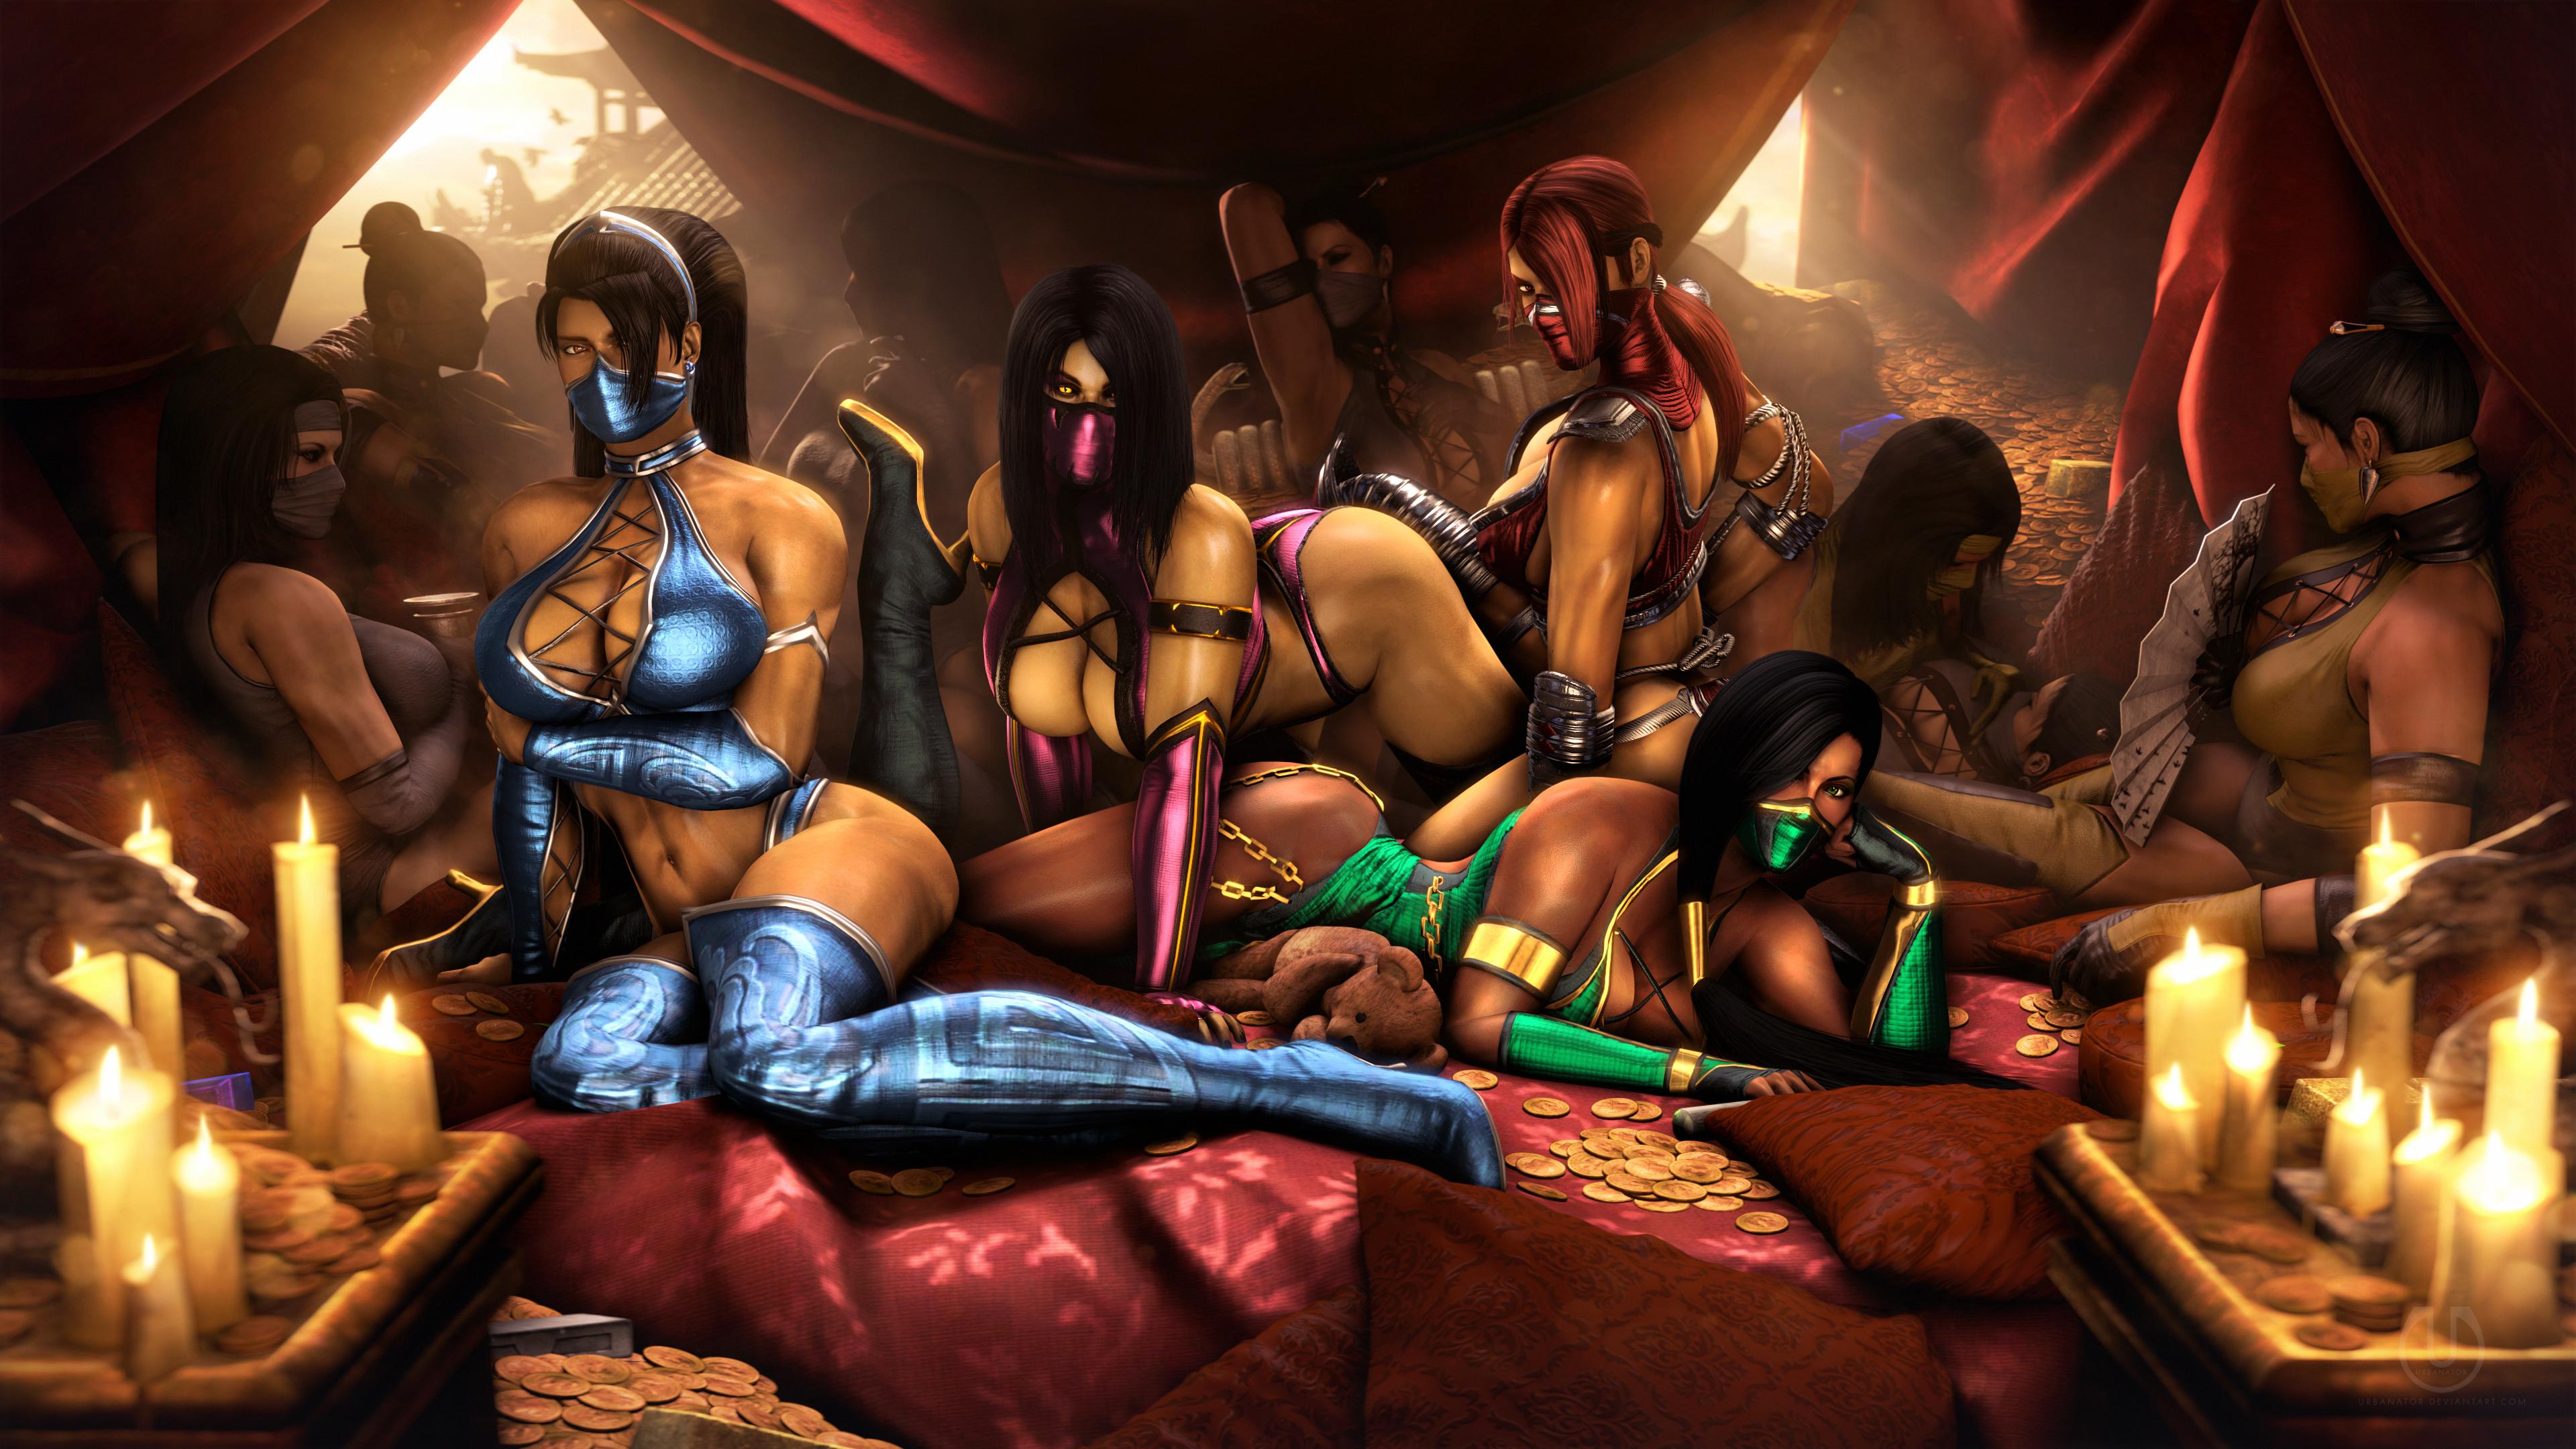 Mortal kombat xxx porn images hentai images